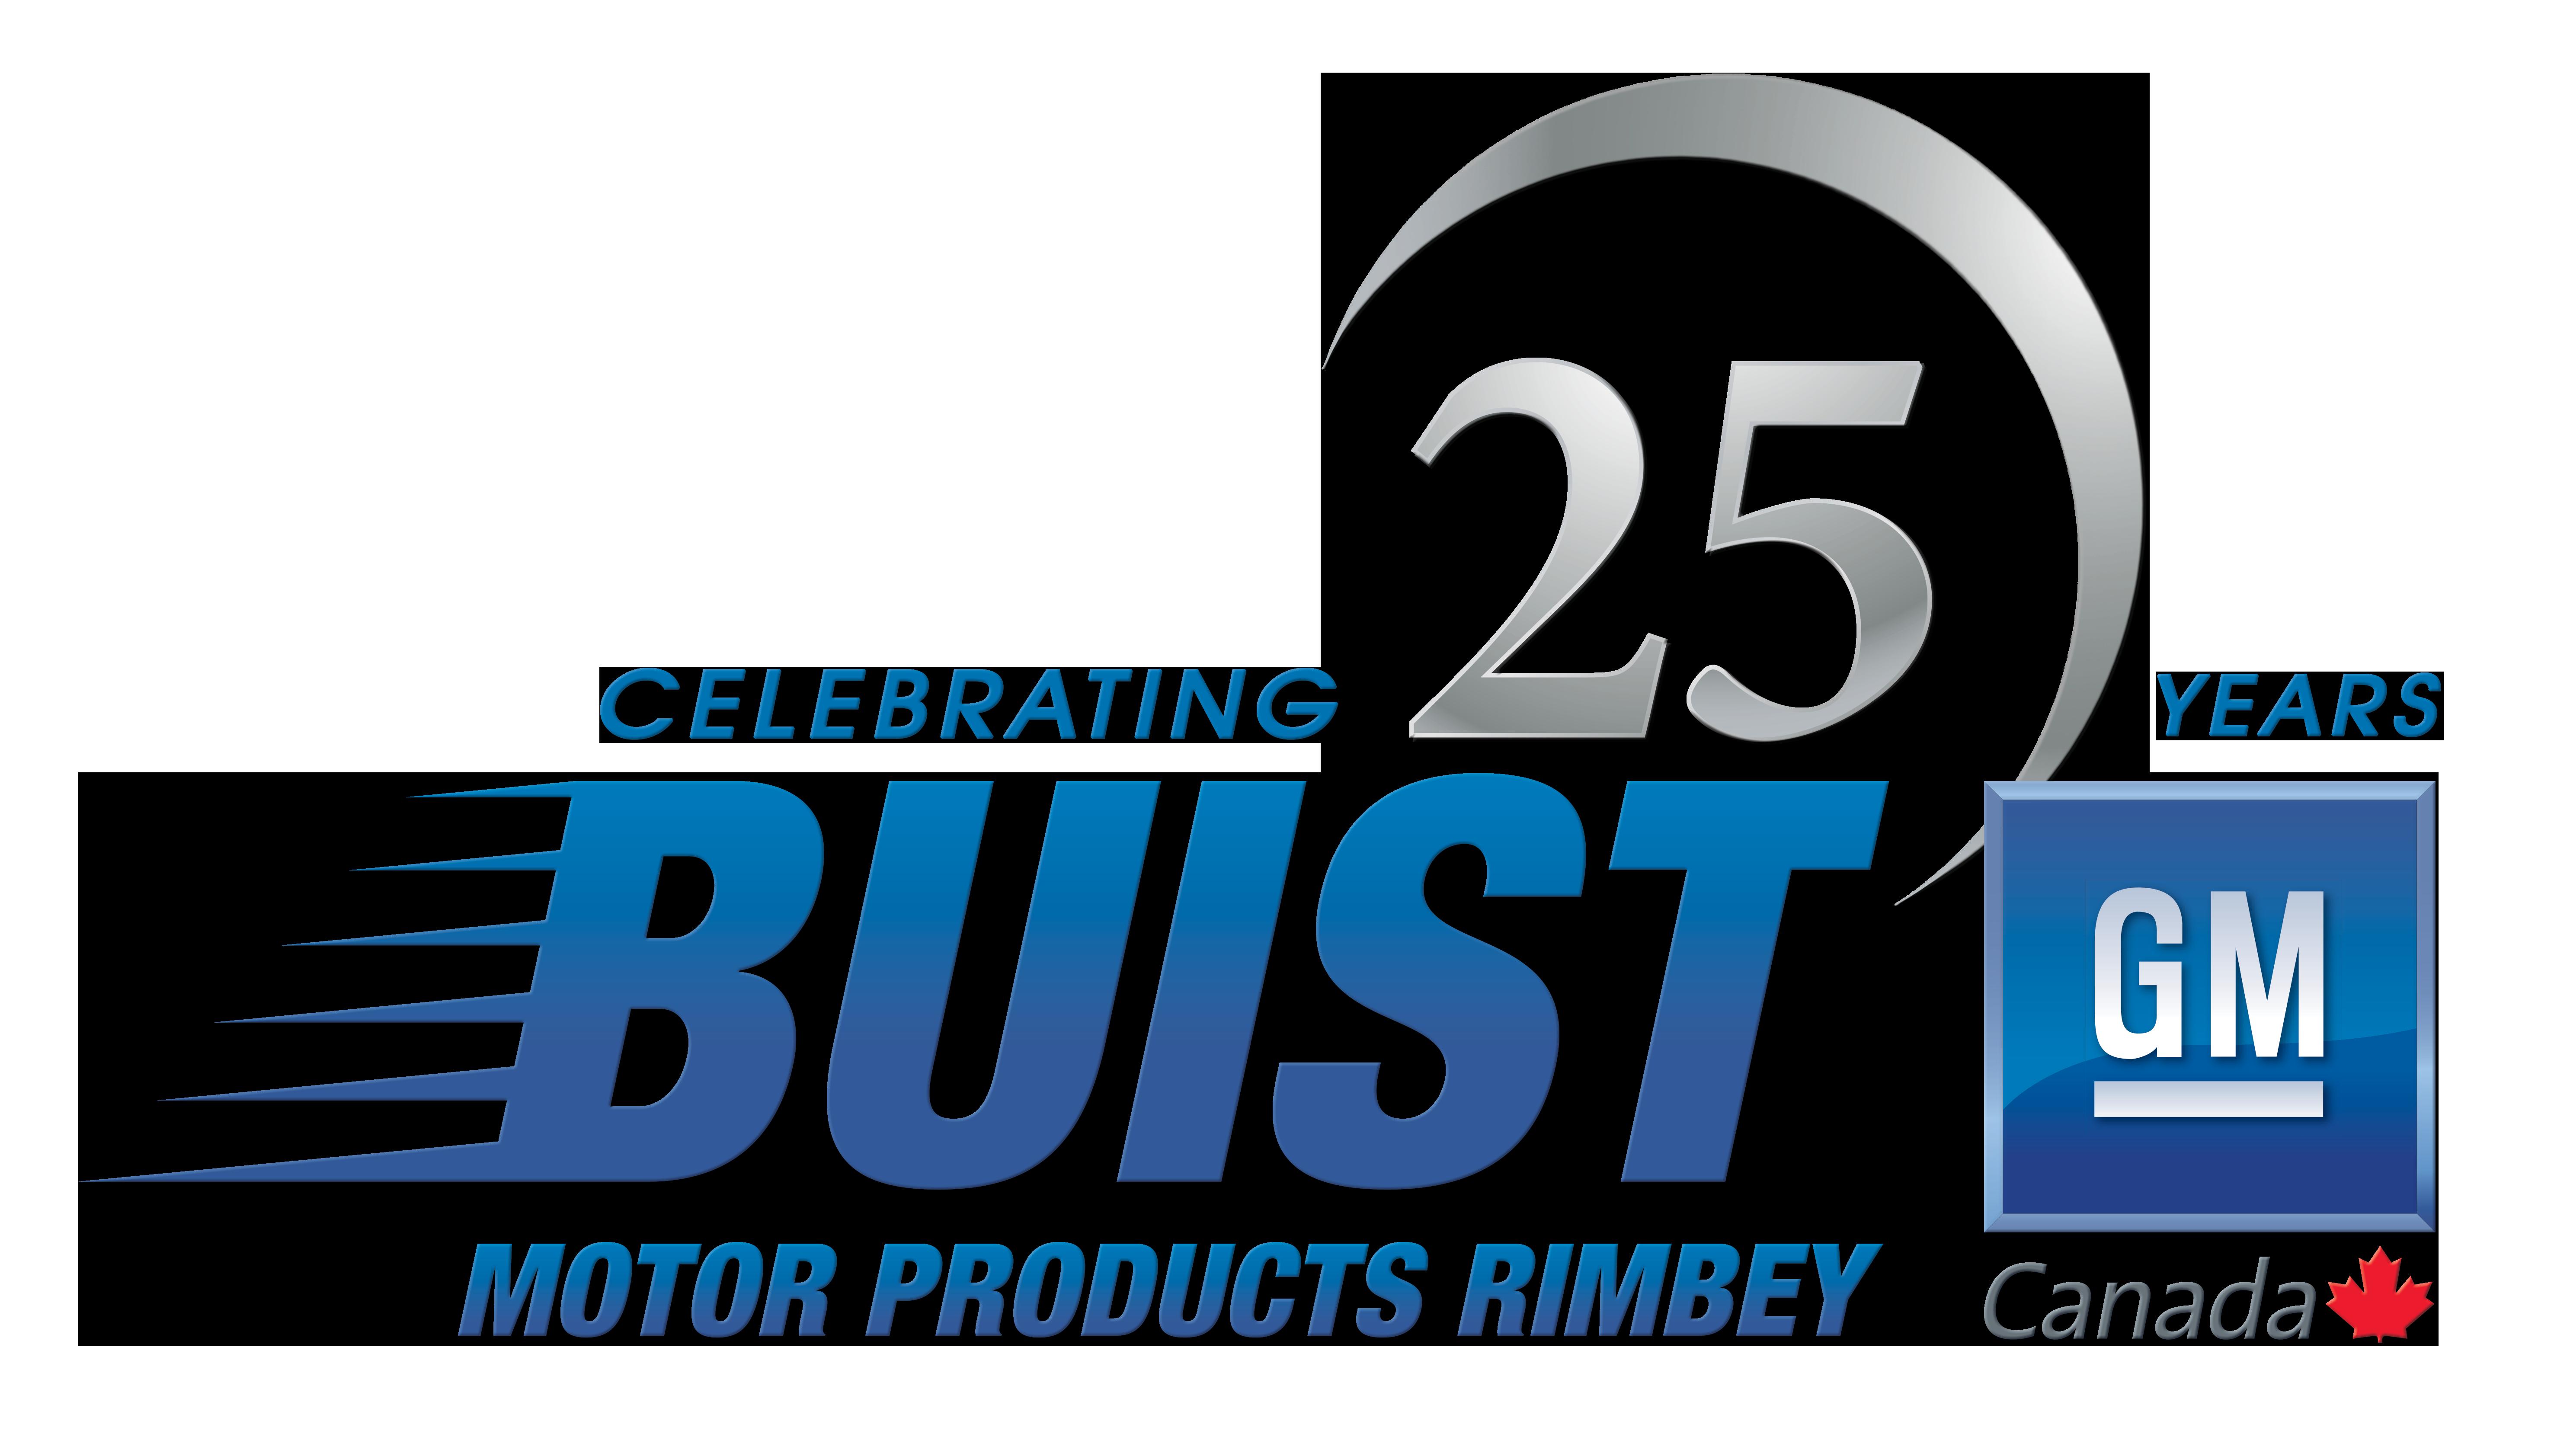 buist gm public documents 25th Anniversary Graphics 25th Wedding Anniversary Clip Art